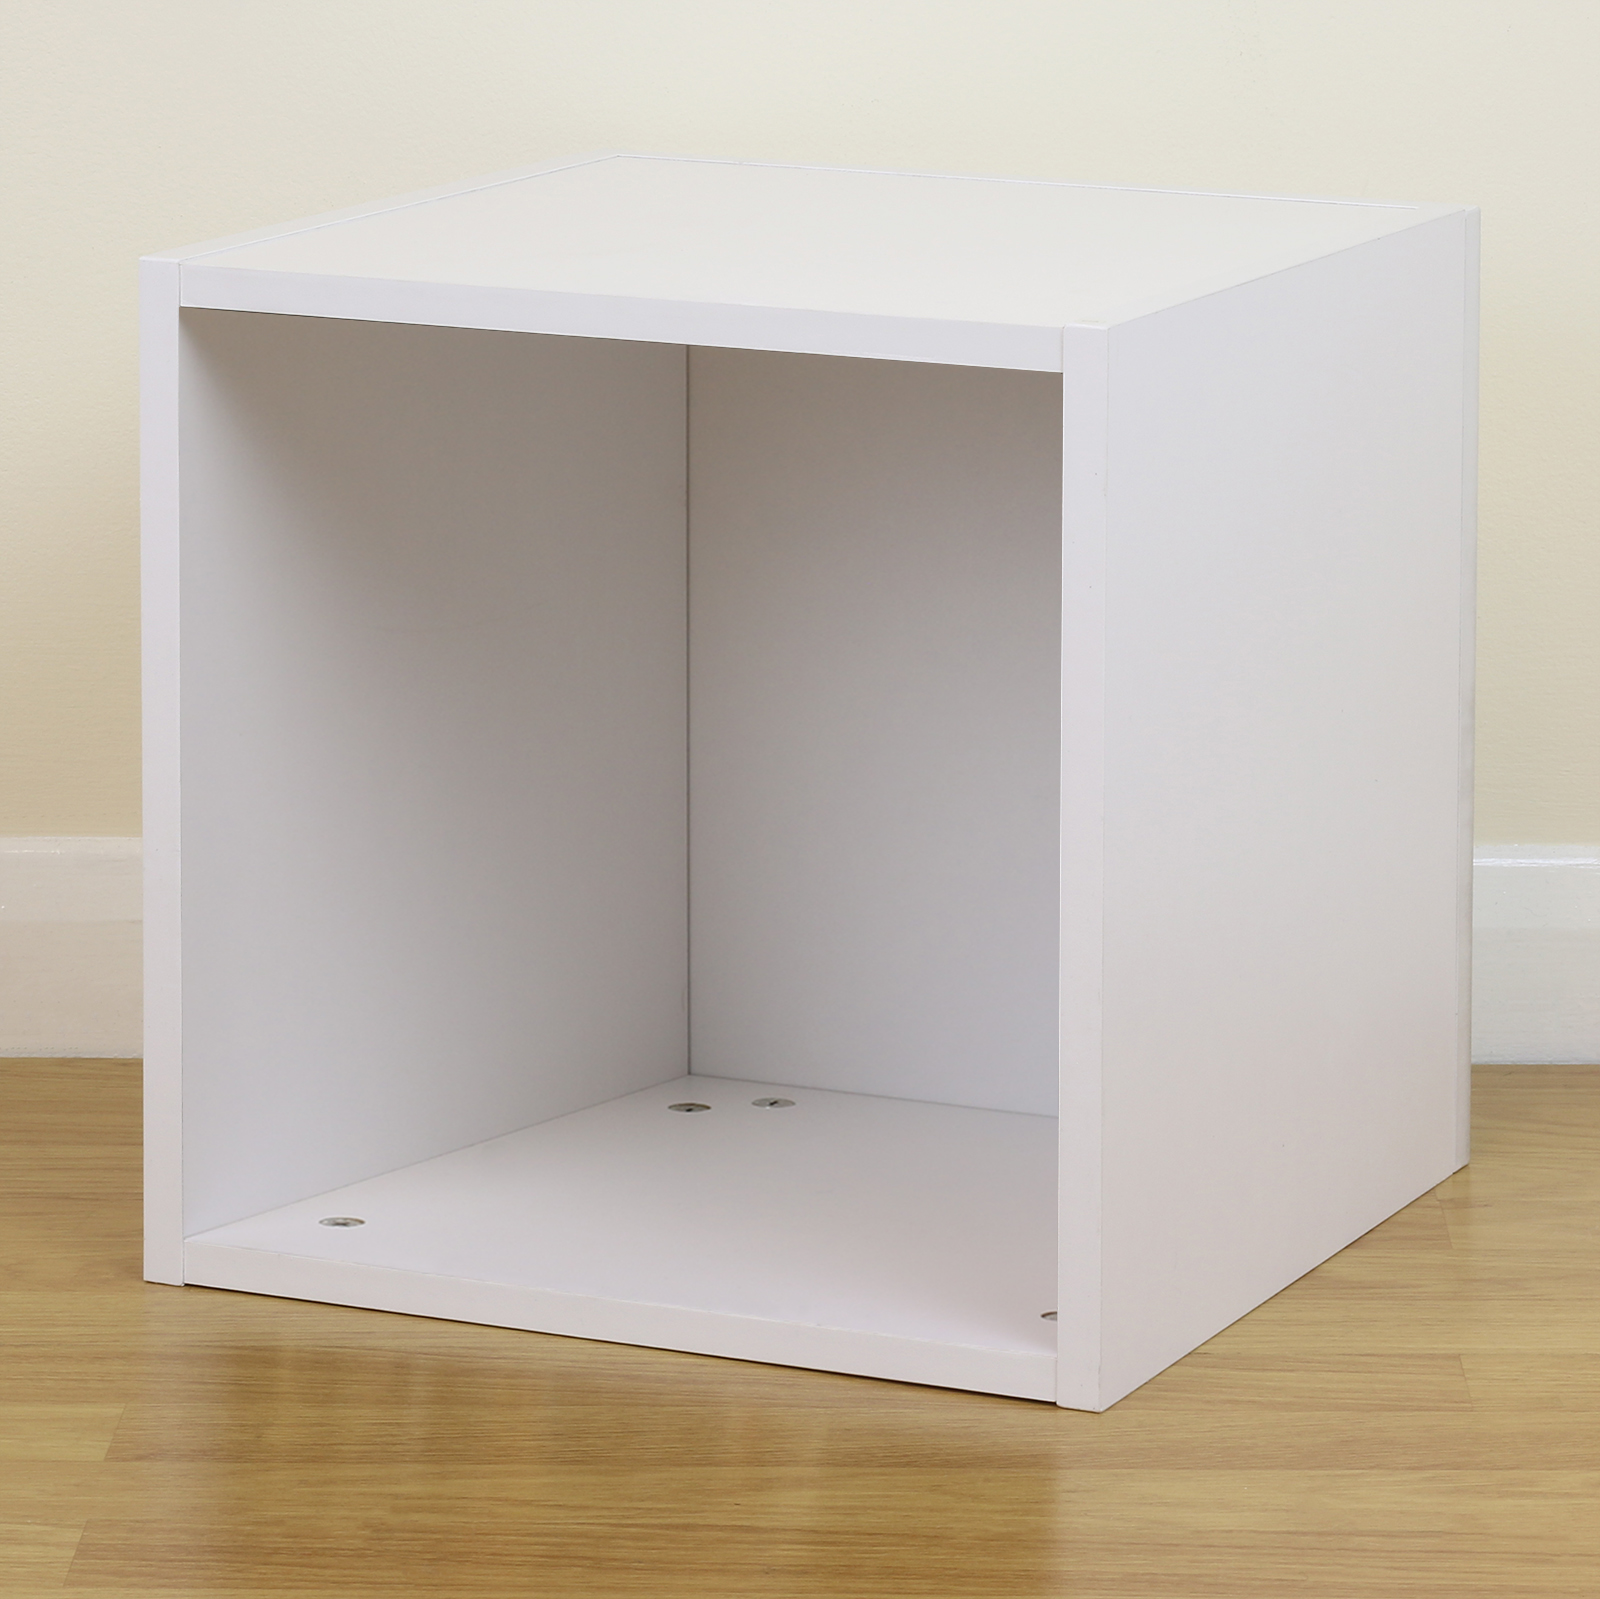 vinyl record storage furniture. Sentinel White Square LP/Vinyl Music Record Storage Cube/Cabinet Box Home Display Unit Vinyl Furniture